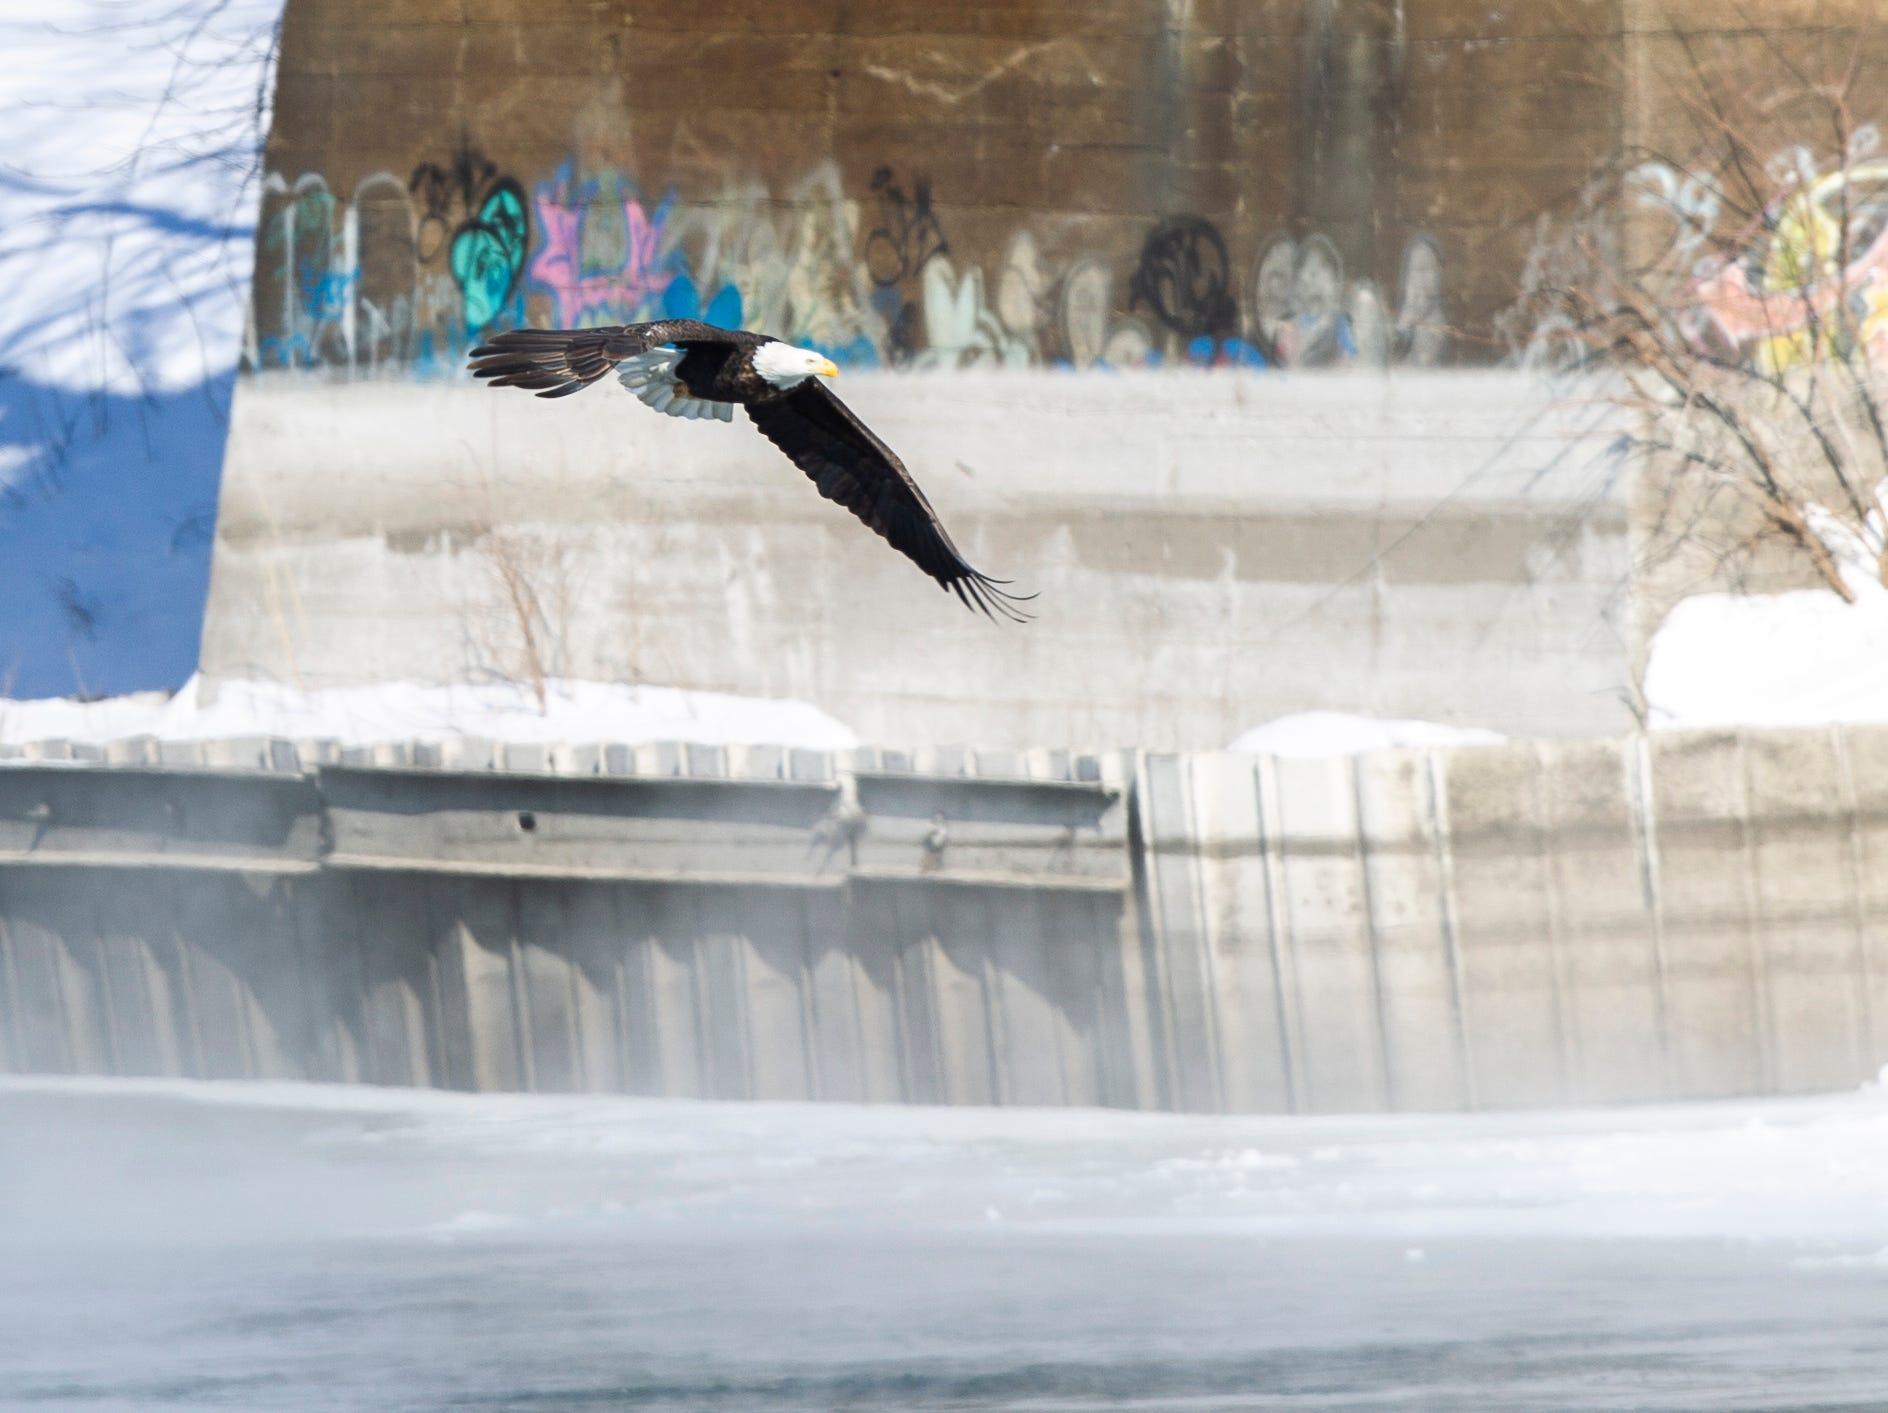 A bald eagle flies over the Iowa River on Wednesday, Jan. 30, 2019, in Iowa City, Iowa.